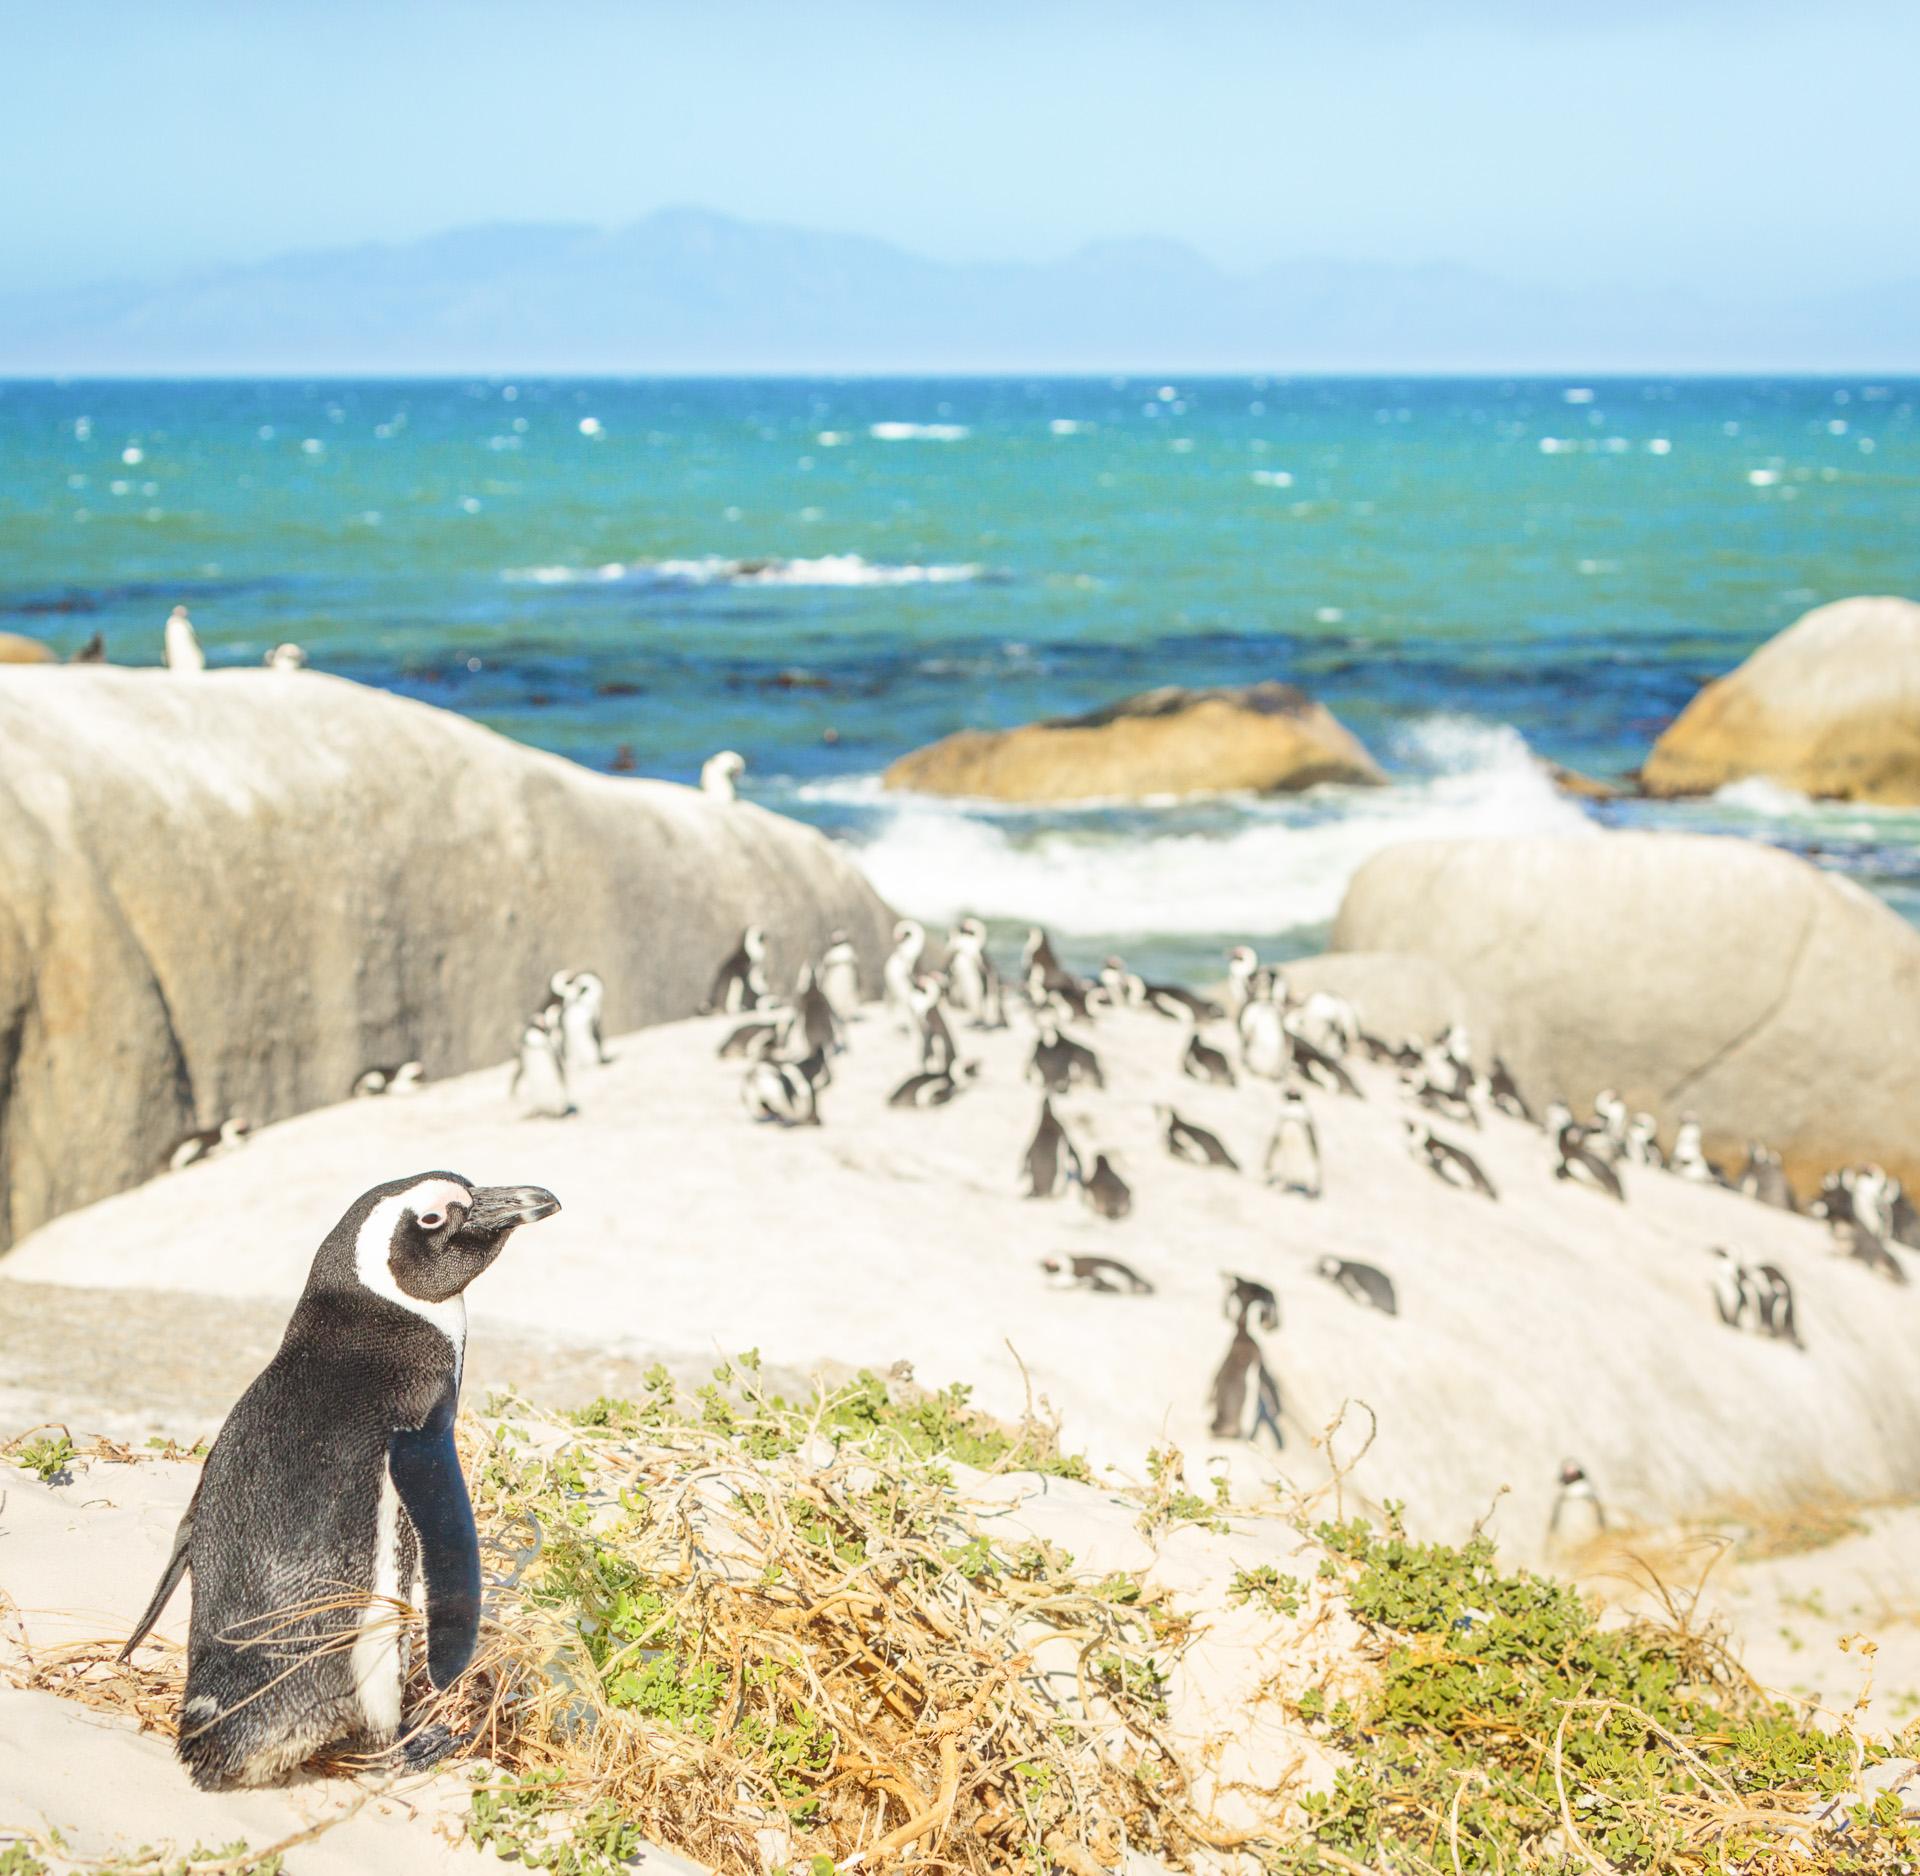 Nett Küchenschränke Südafrika Kapstadt Fotos - Küchenschrank Ideen ...